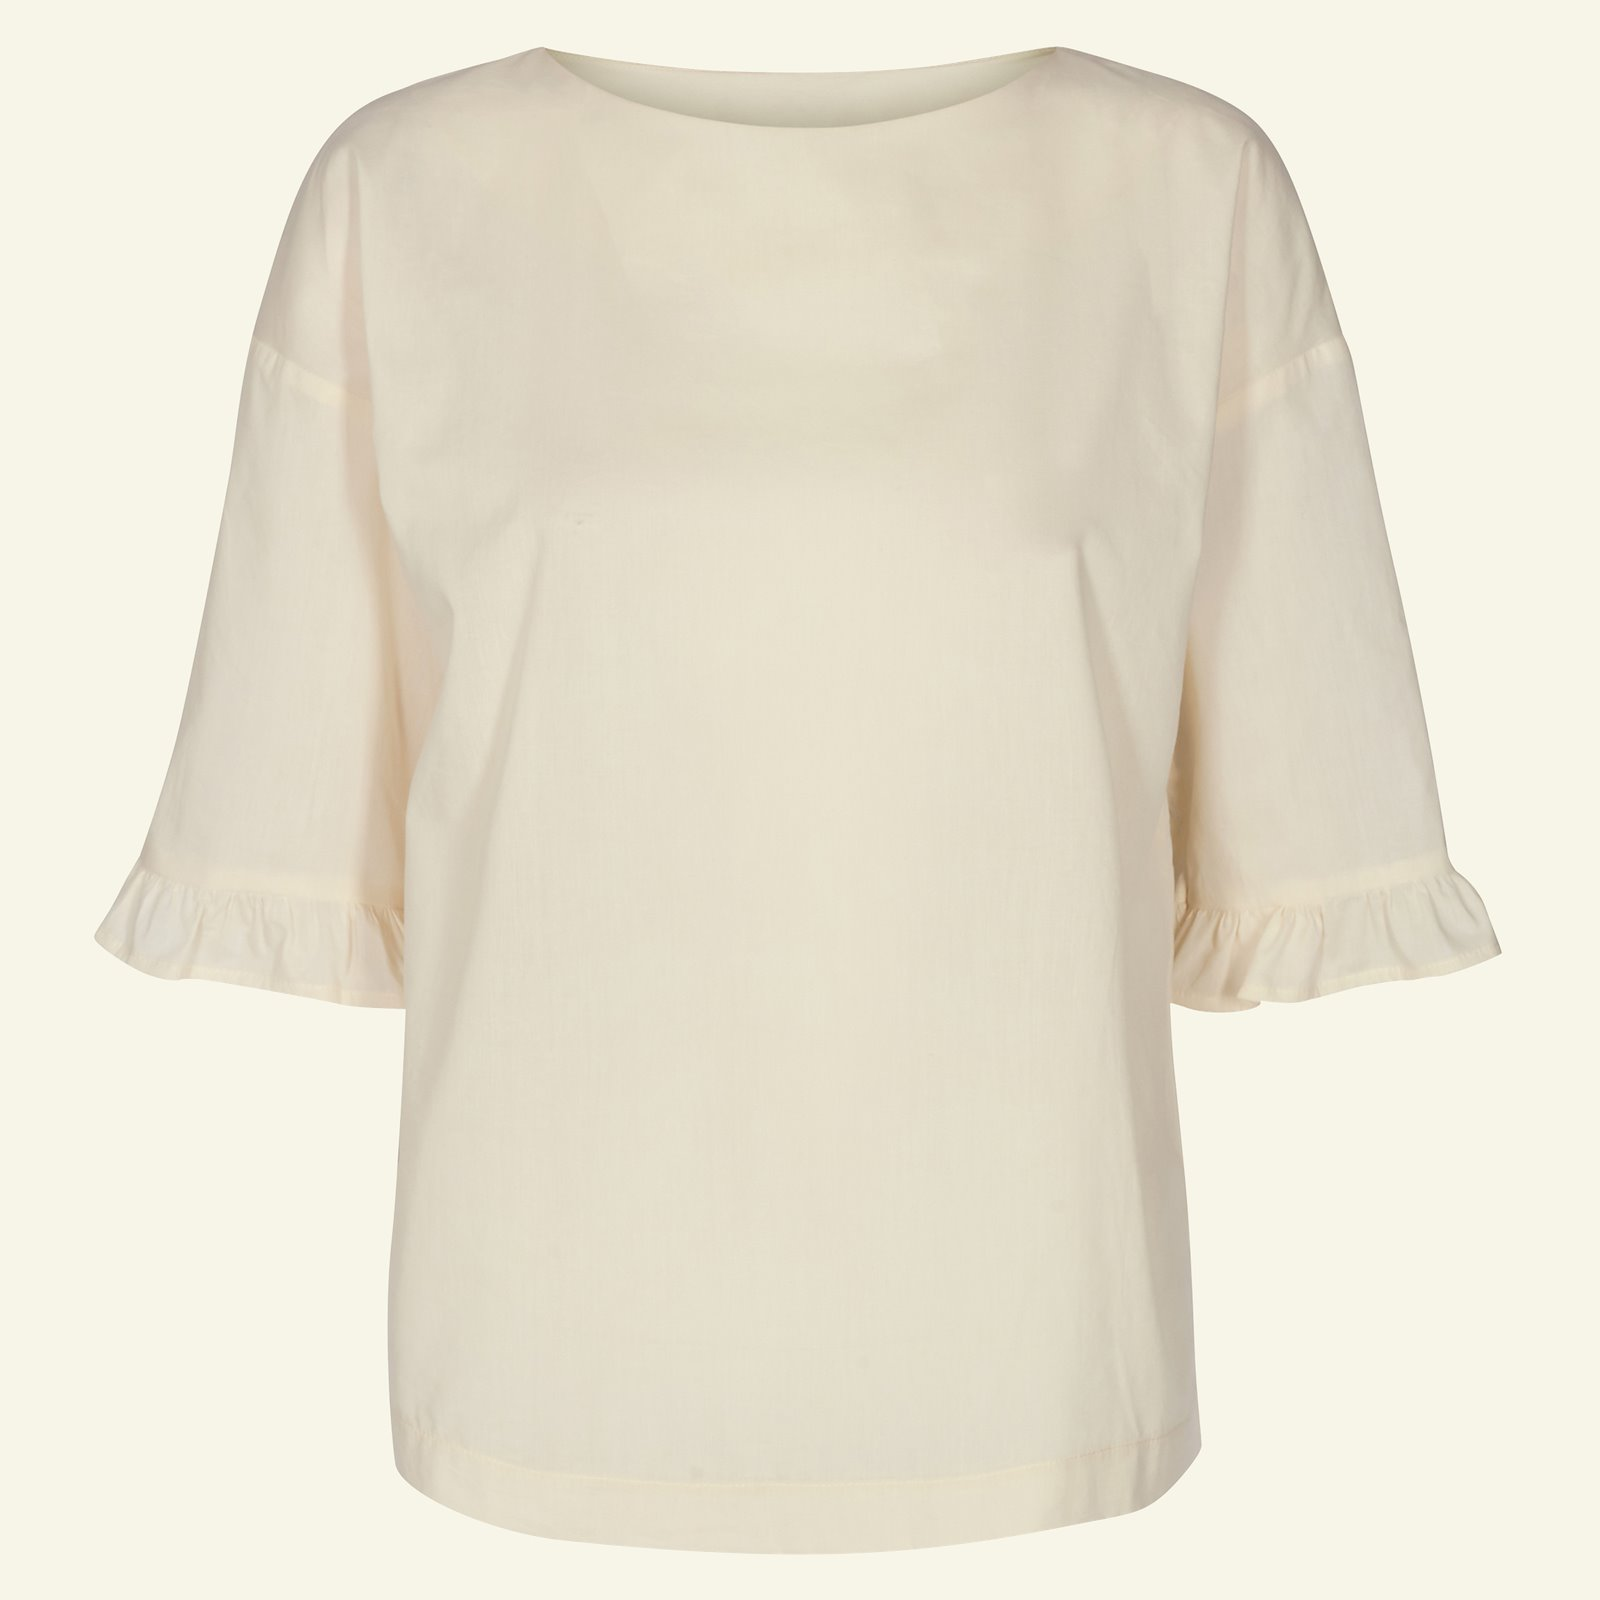 Dress and blouse, 44/16 p23161_540105_sskit